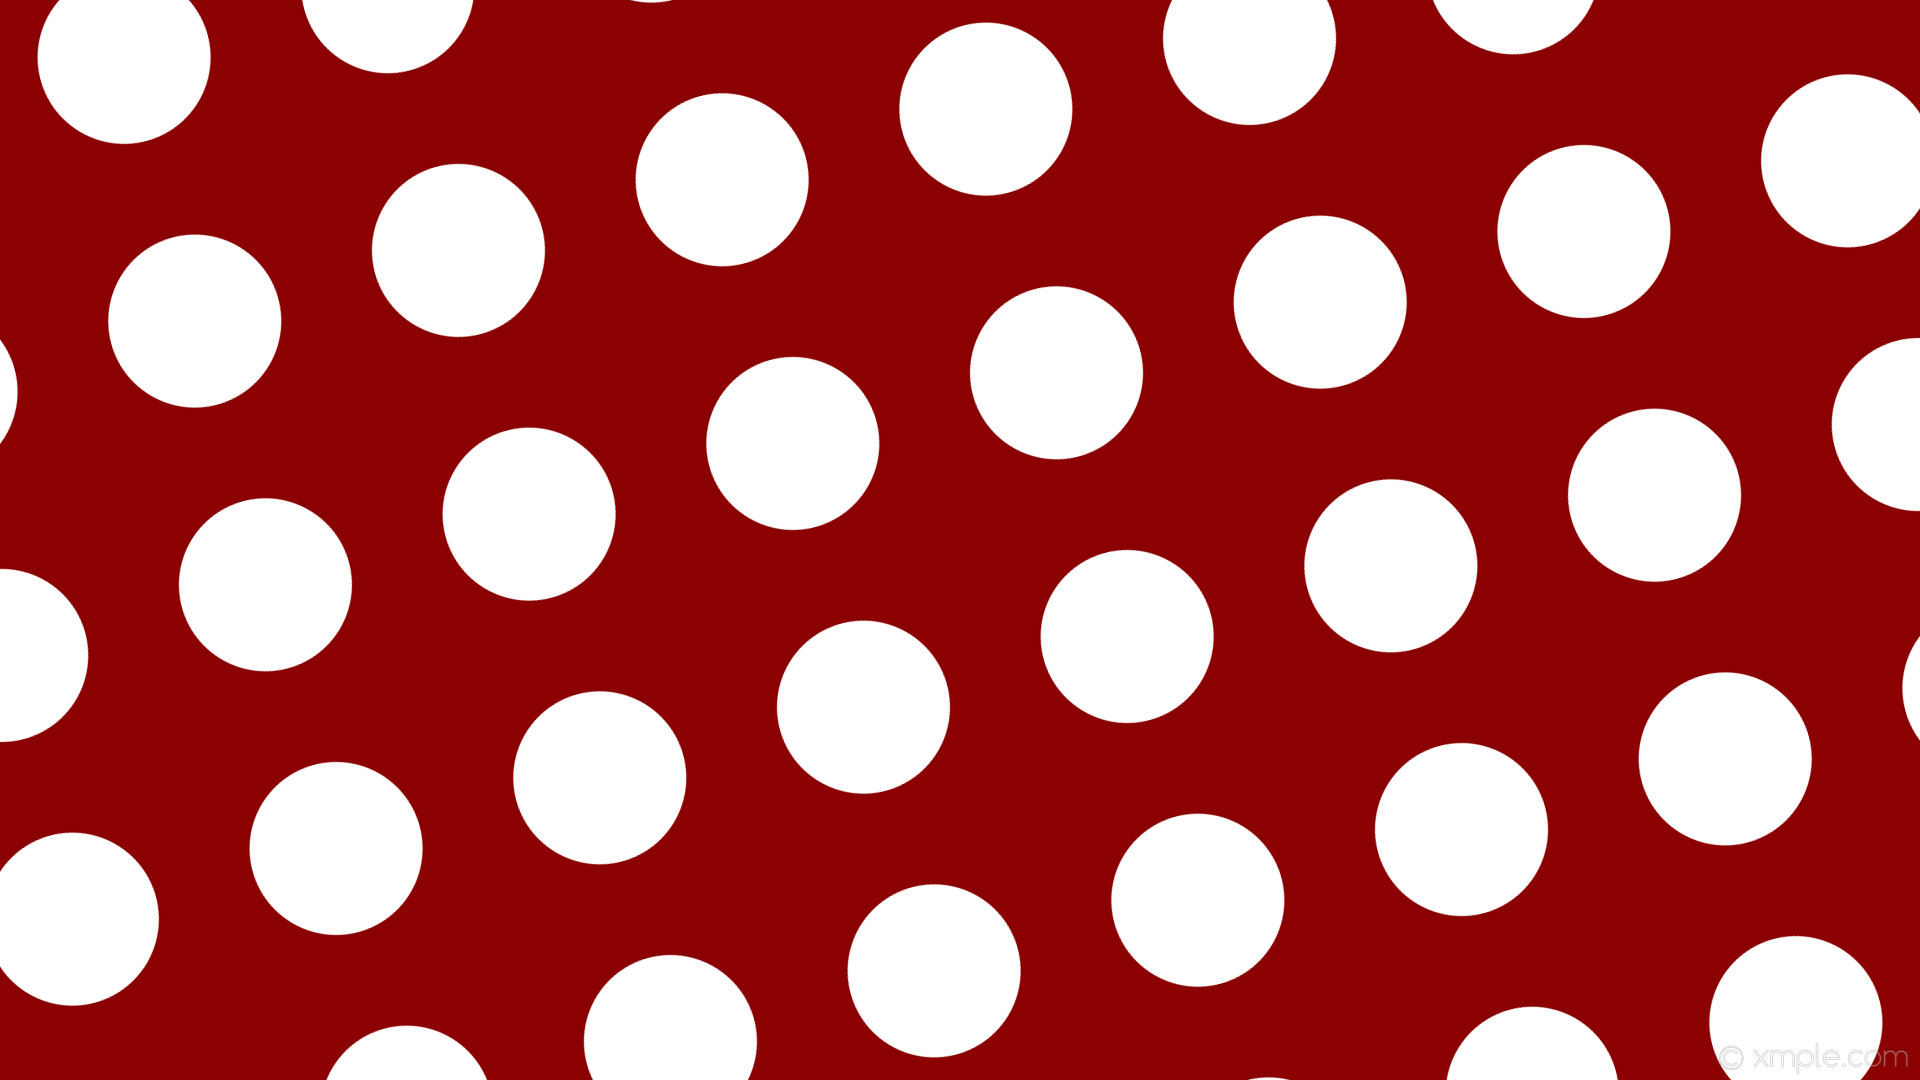 wallpaper red polka dots white spots dark red #8b0000 #ffffff 15° 173px  273px